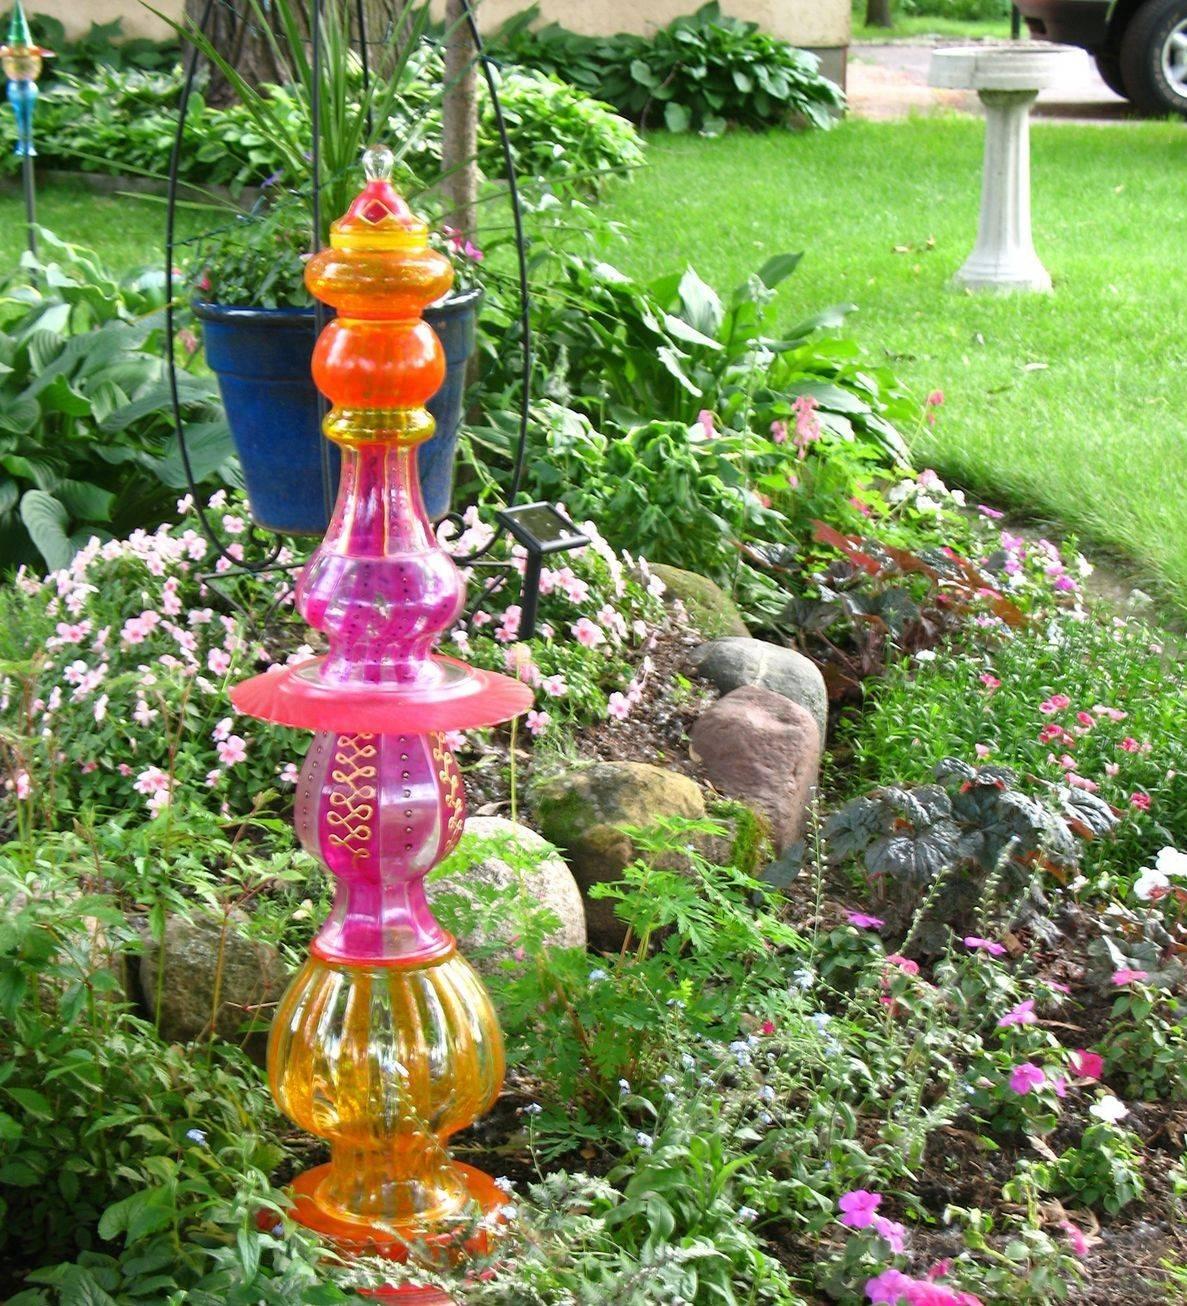 diy garden easy-370139663119344777